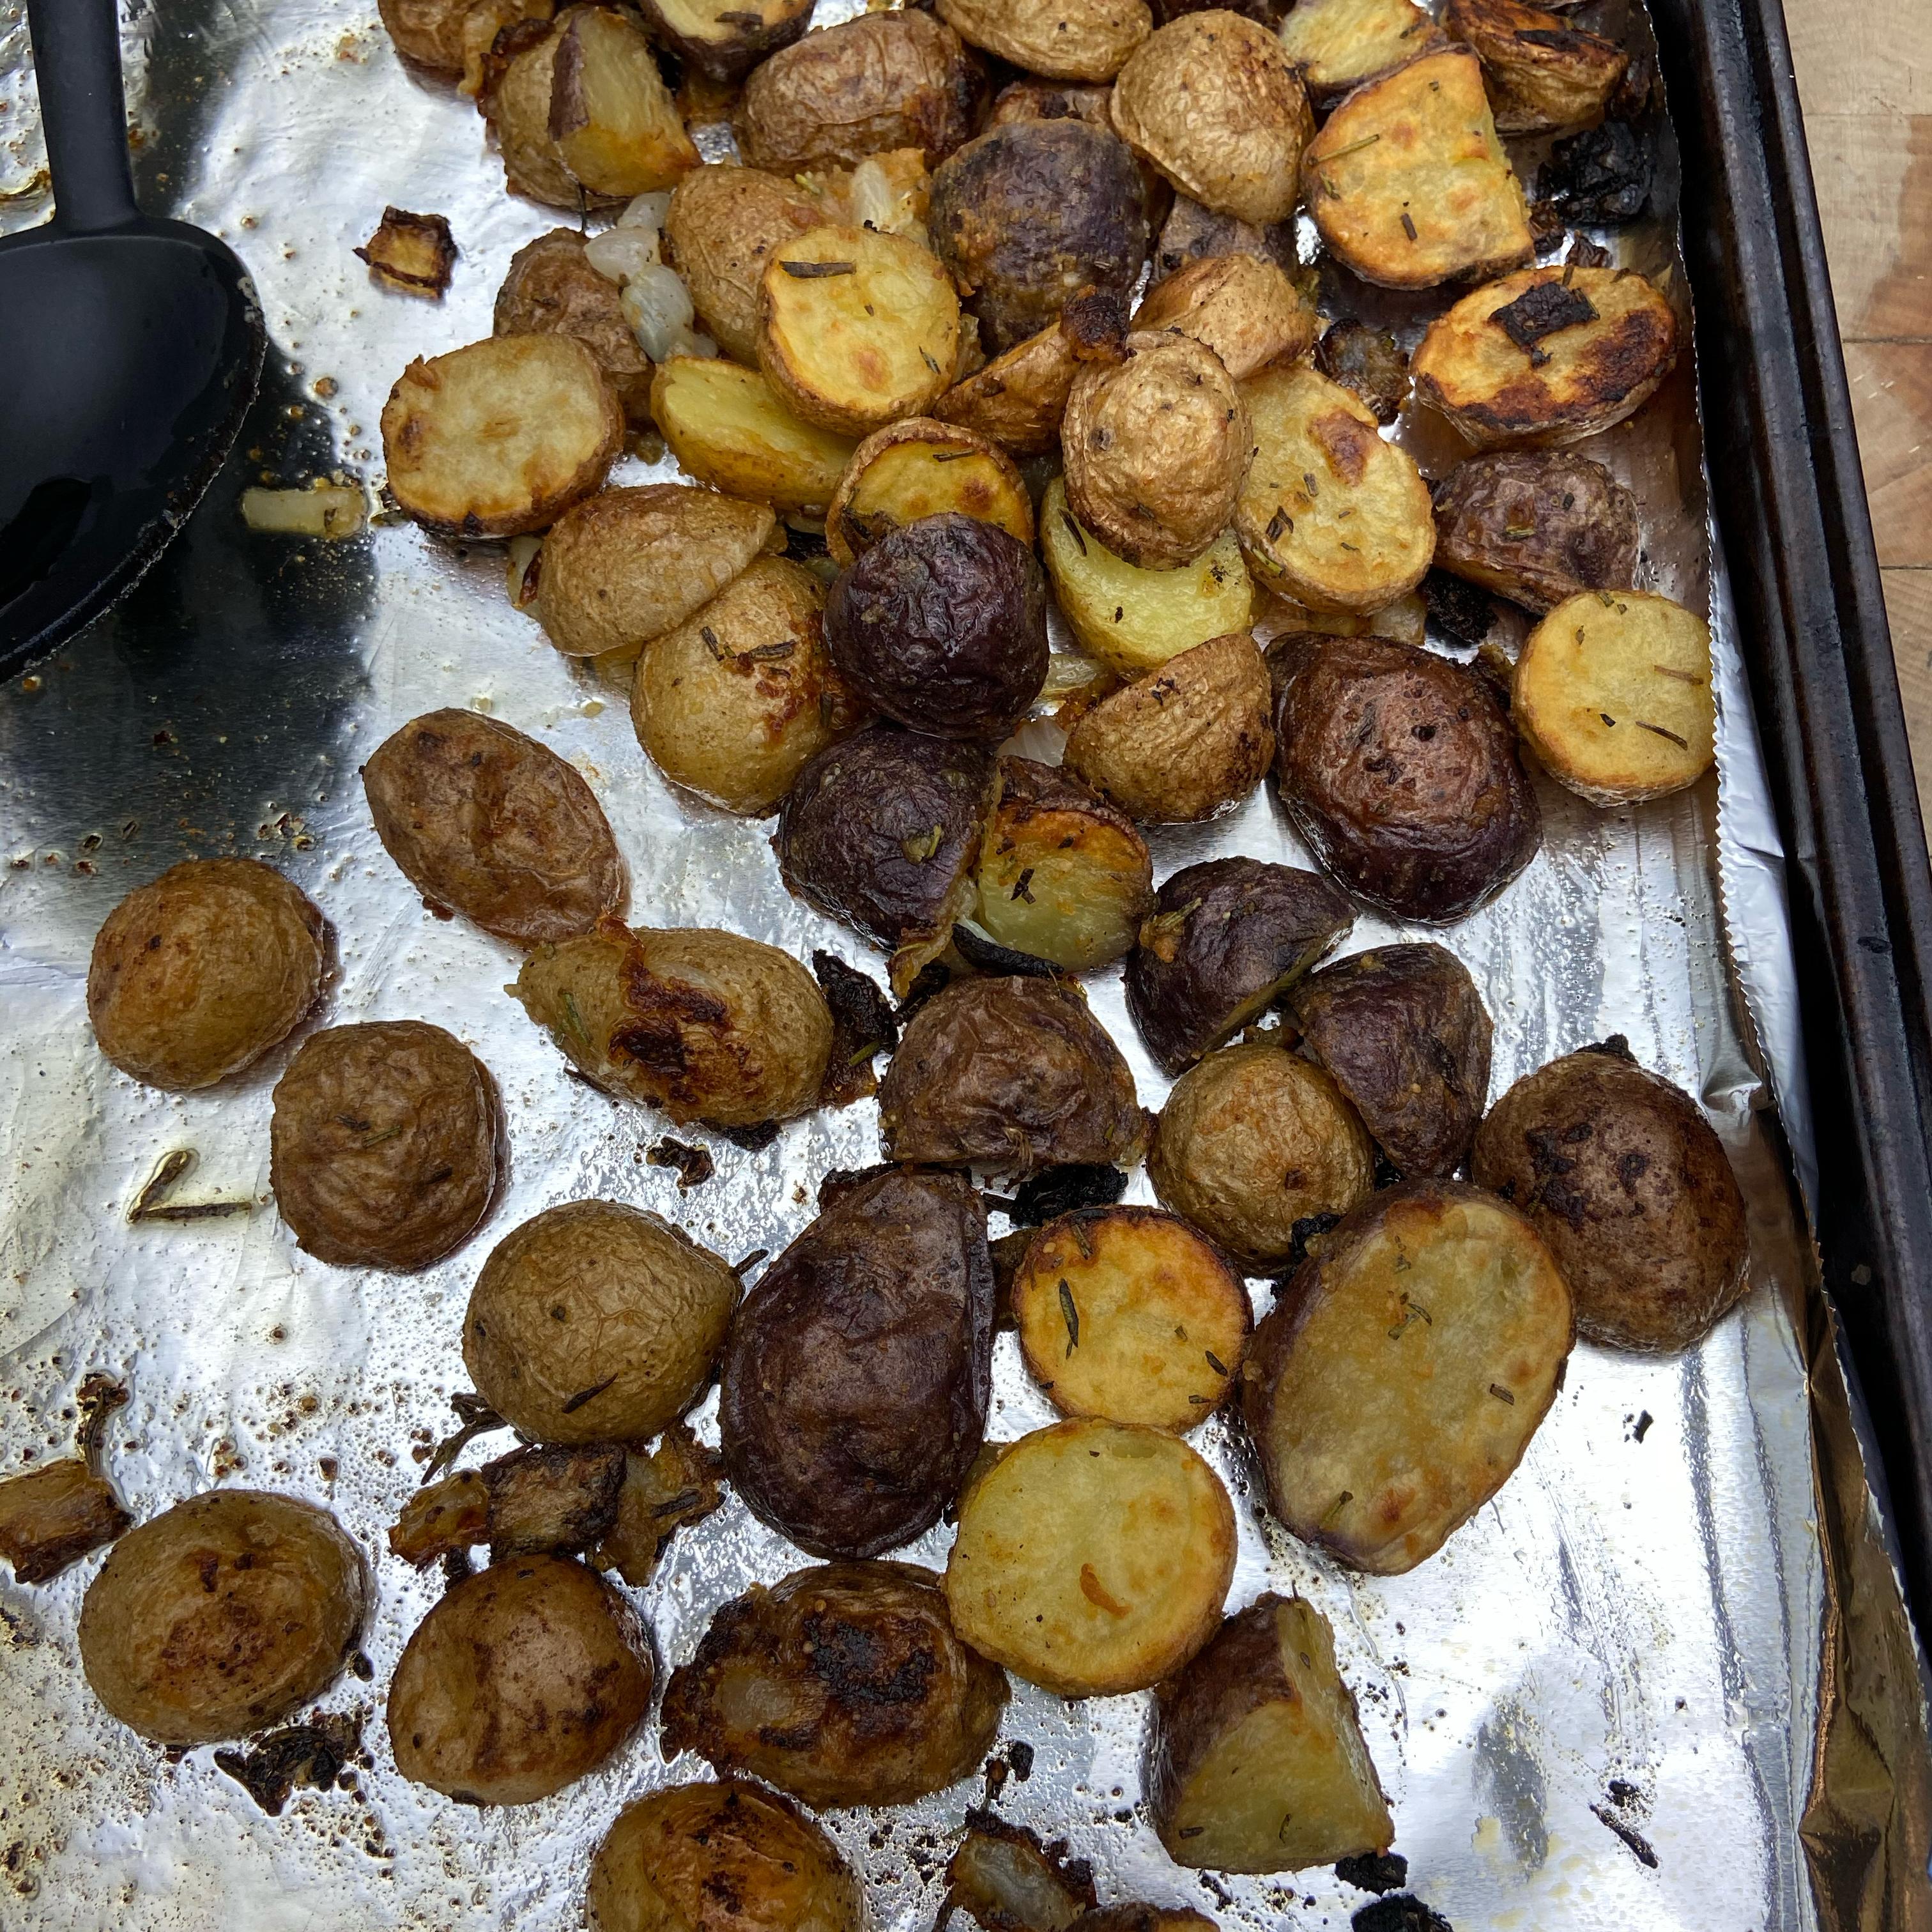 Roasted Parmesan Rosemary Potatoes Melissa Bullock-Bianco